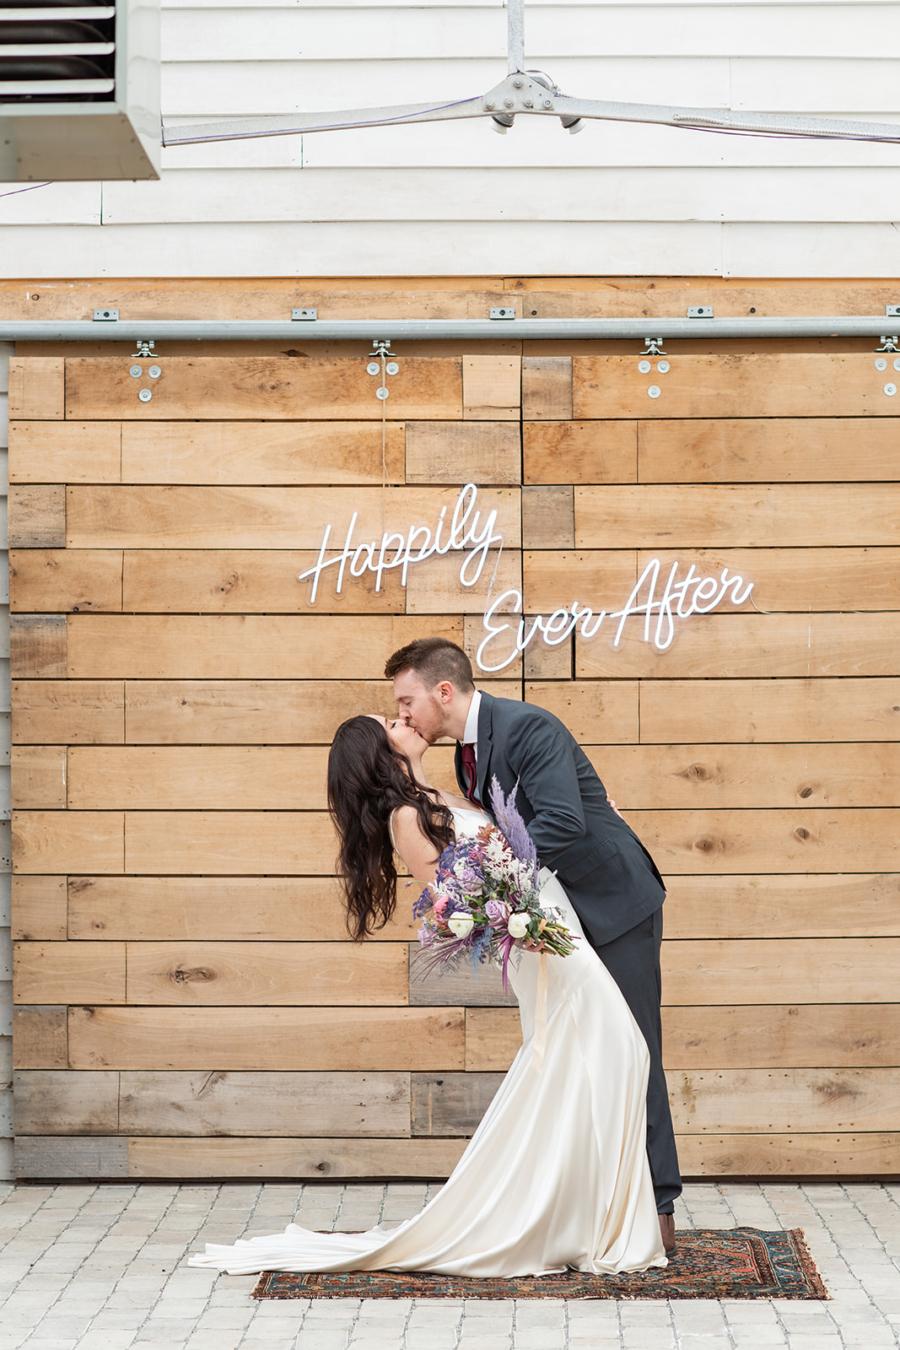 Nash Neon wedding ceremony sign